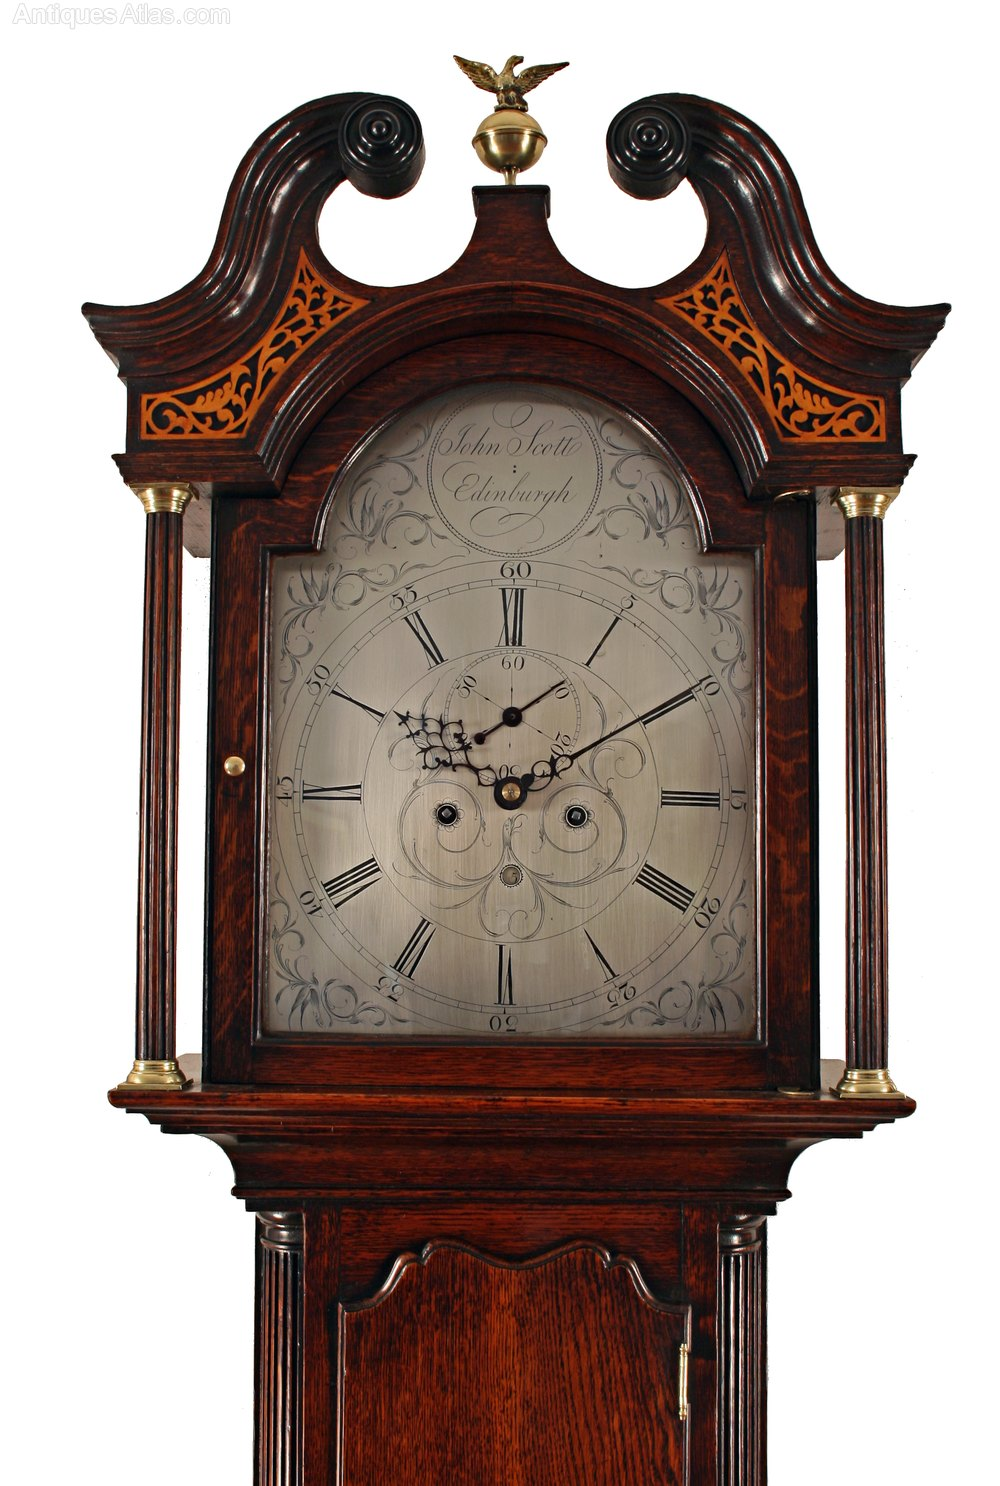 Antiques Atlas - Oak Longcase Clock By Scott Of Edinburgh